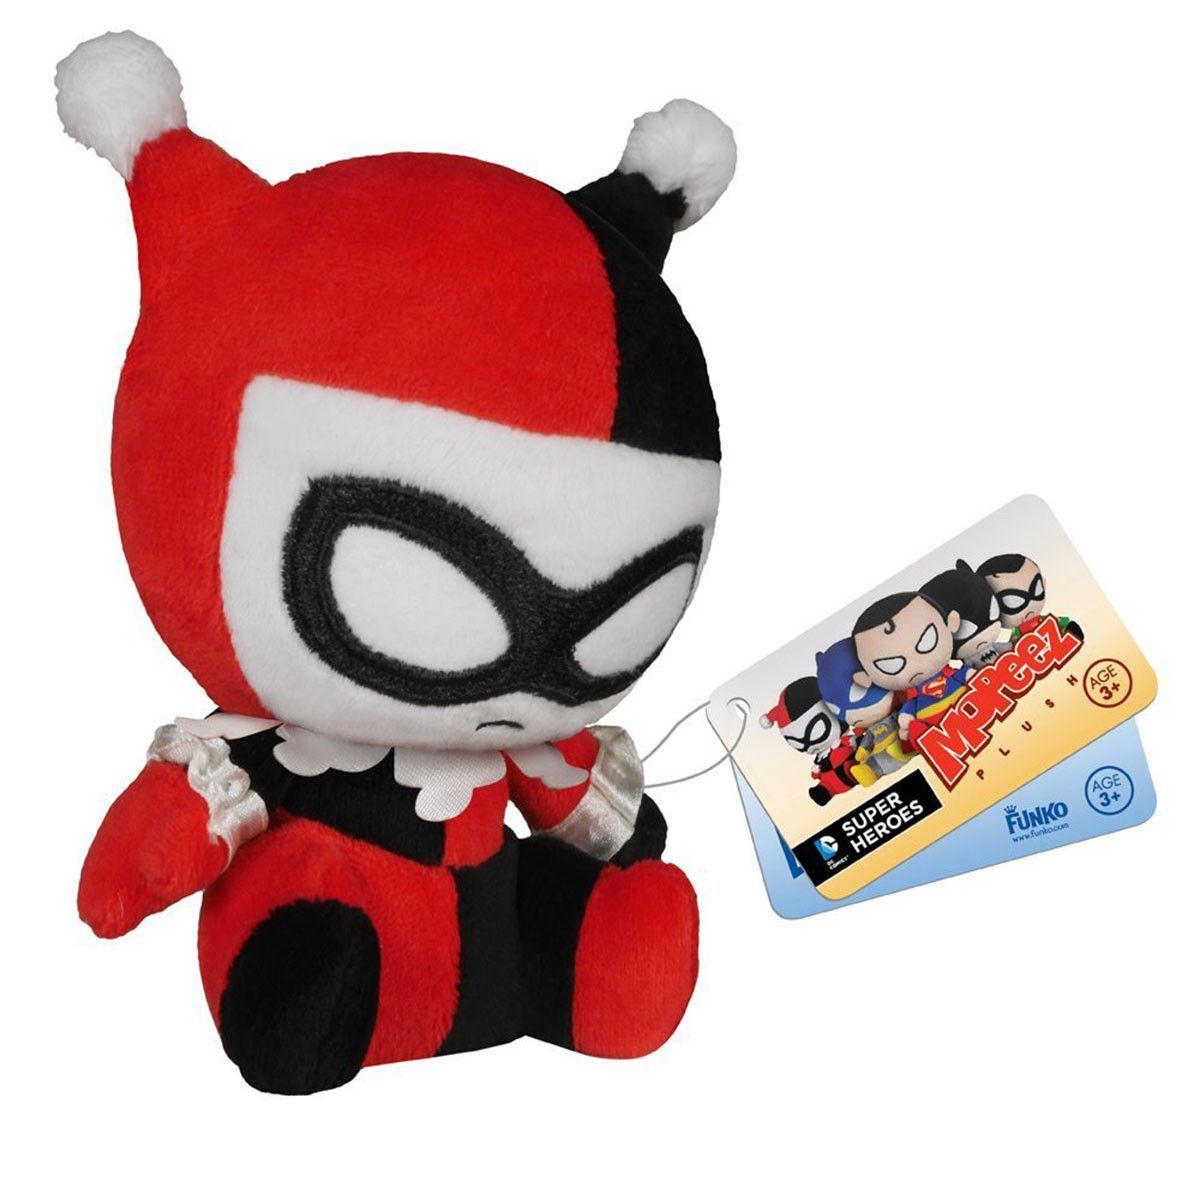 DC Comics Mopeez Harley Quinn Plush Figure